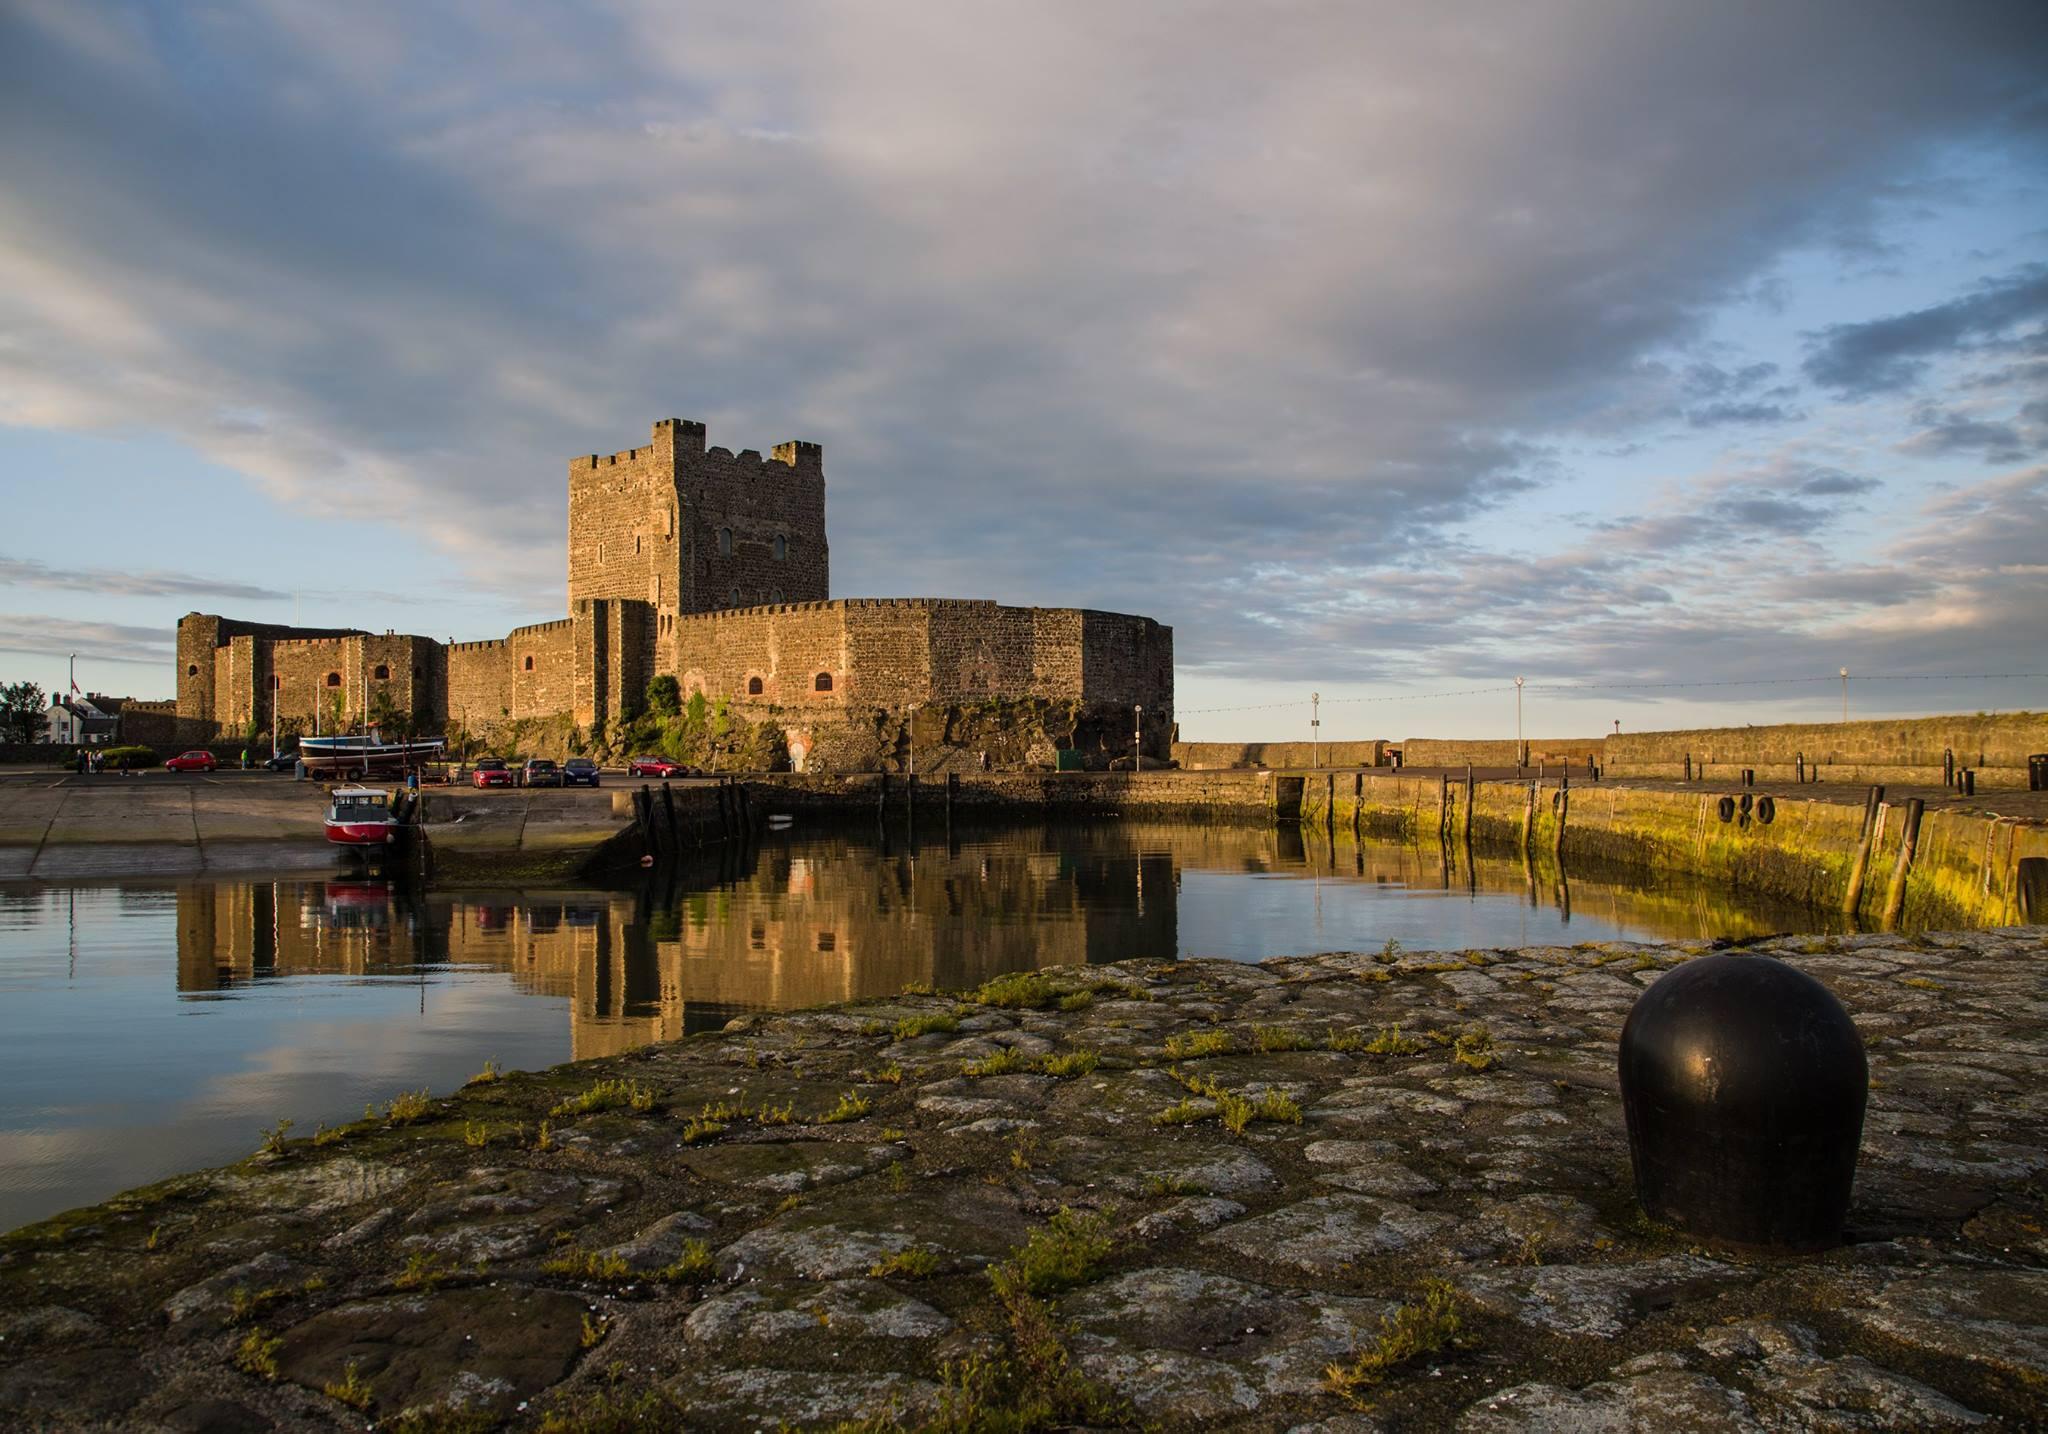 Carrickfergus Castle seen across the harbor.